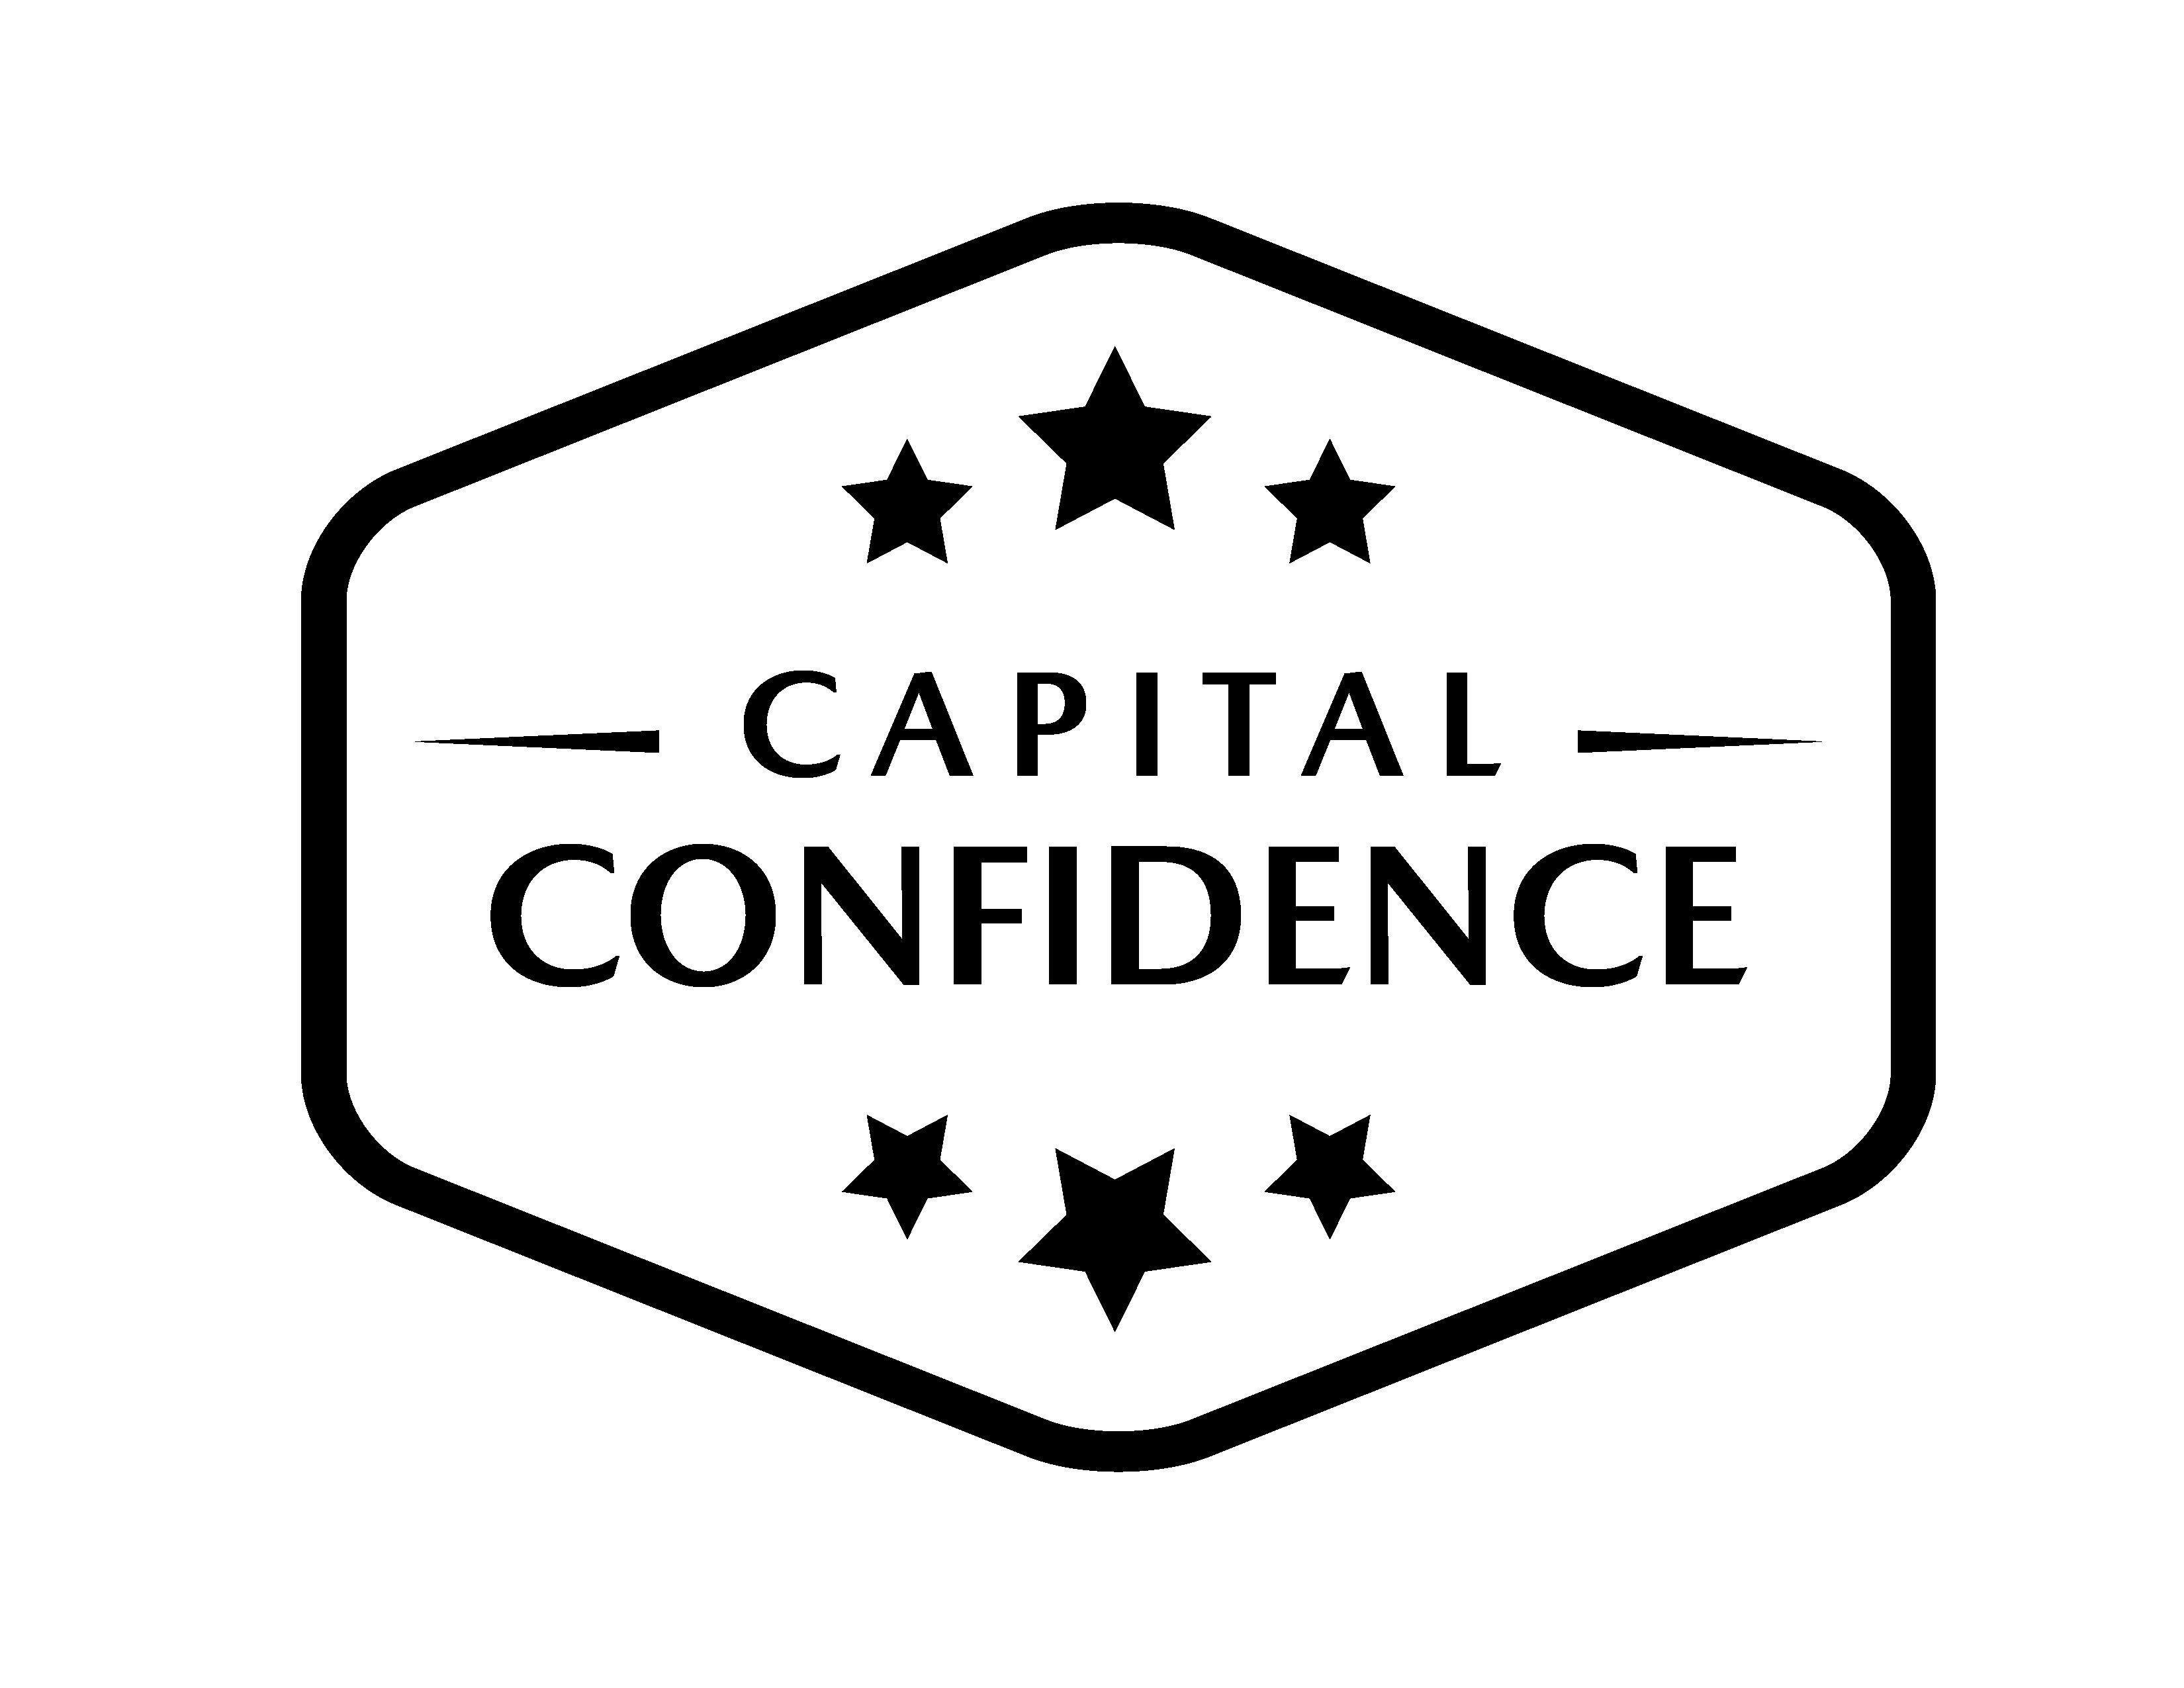 Capital Confidence logo